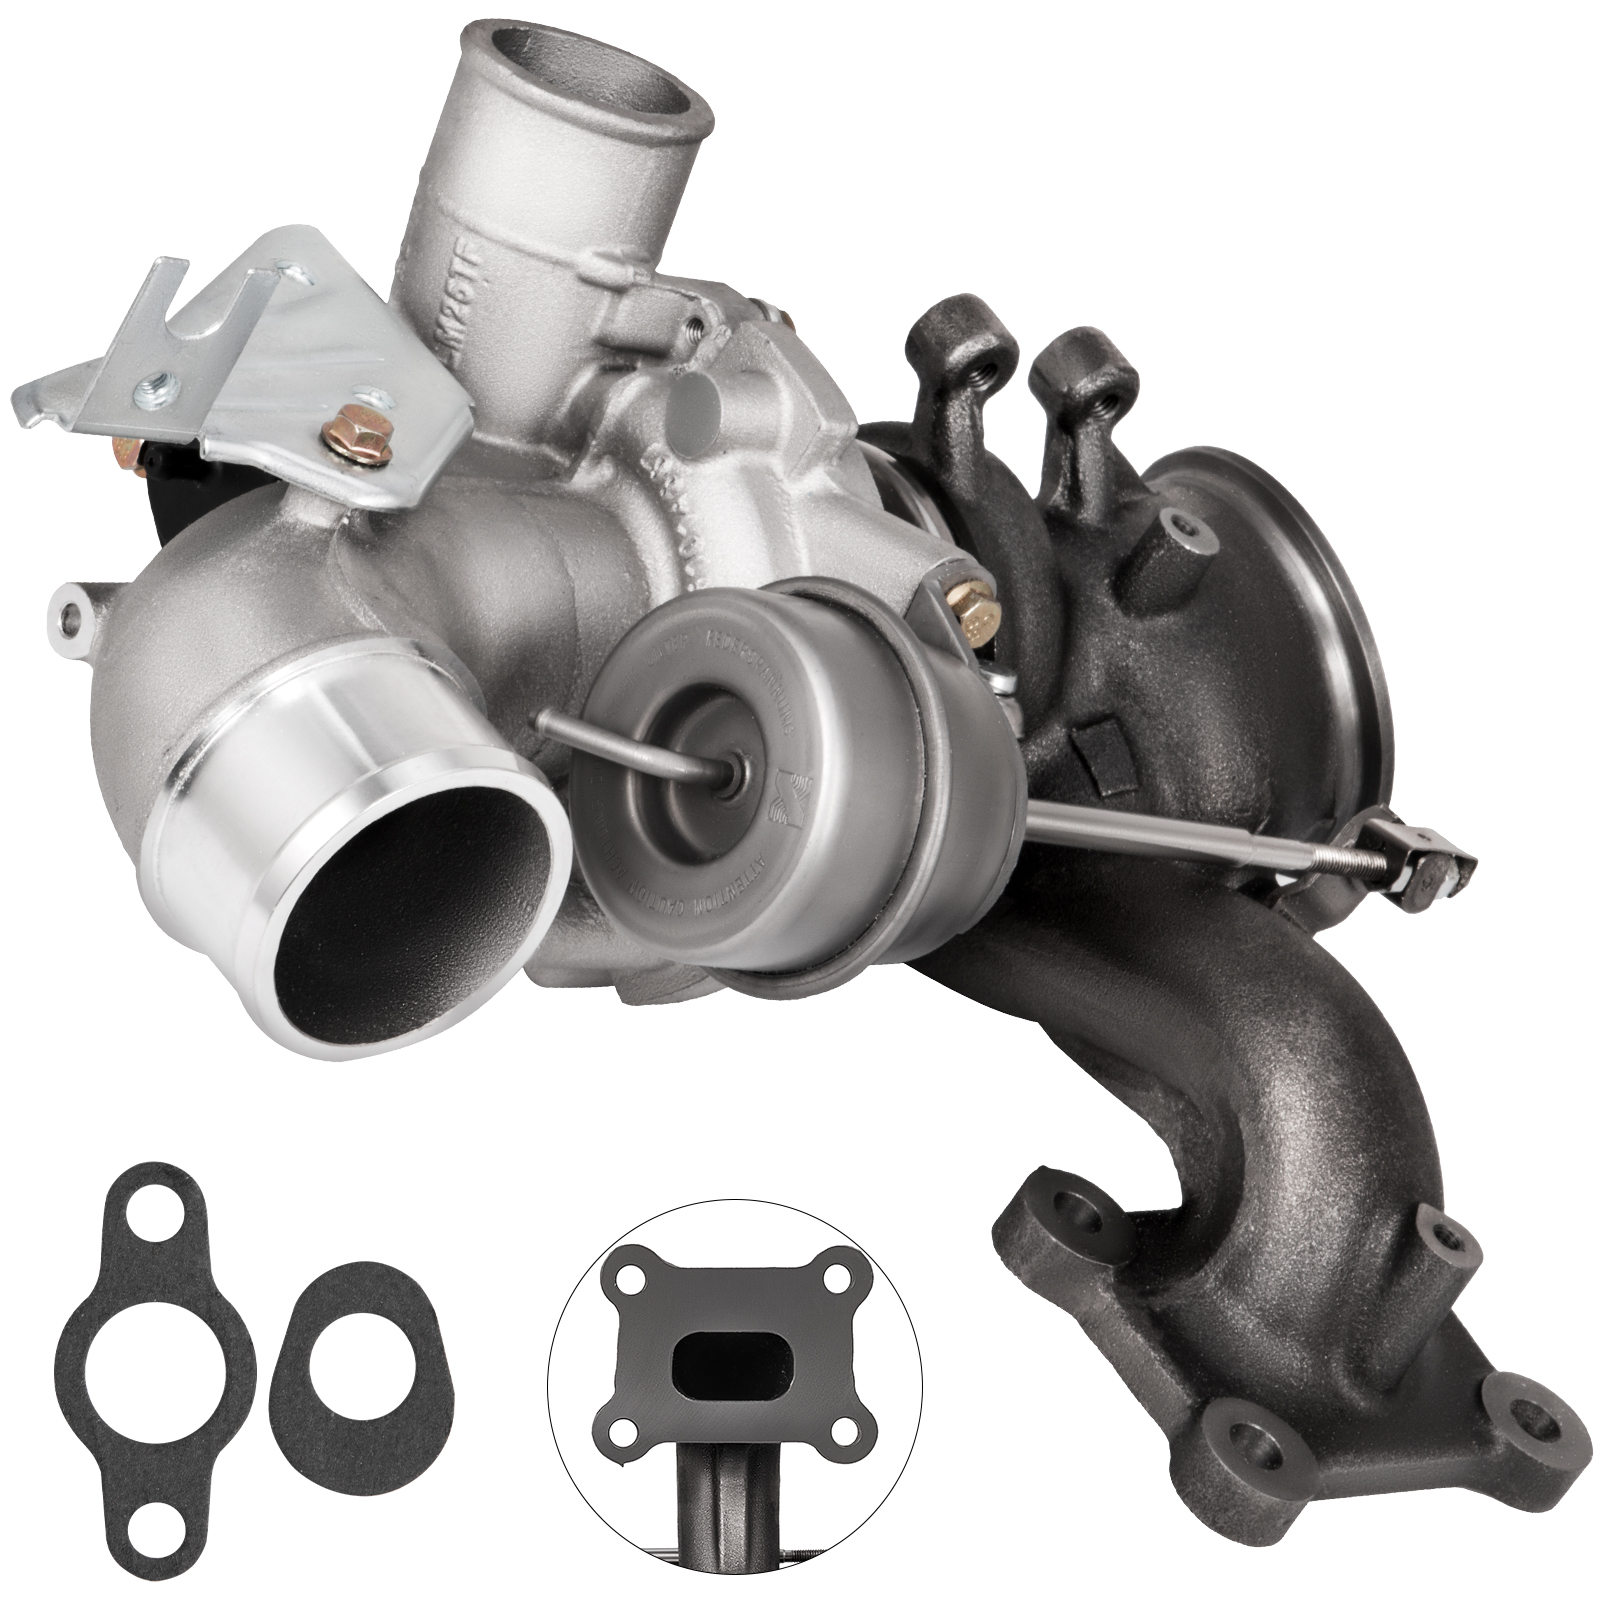 2.0 L Ecoboost >> Turbo Turbocharger For 09 14 Ford Explorer Edge Focus 2 0l Ecoboost